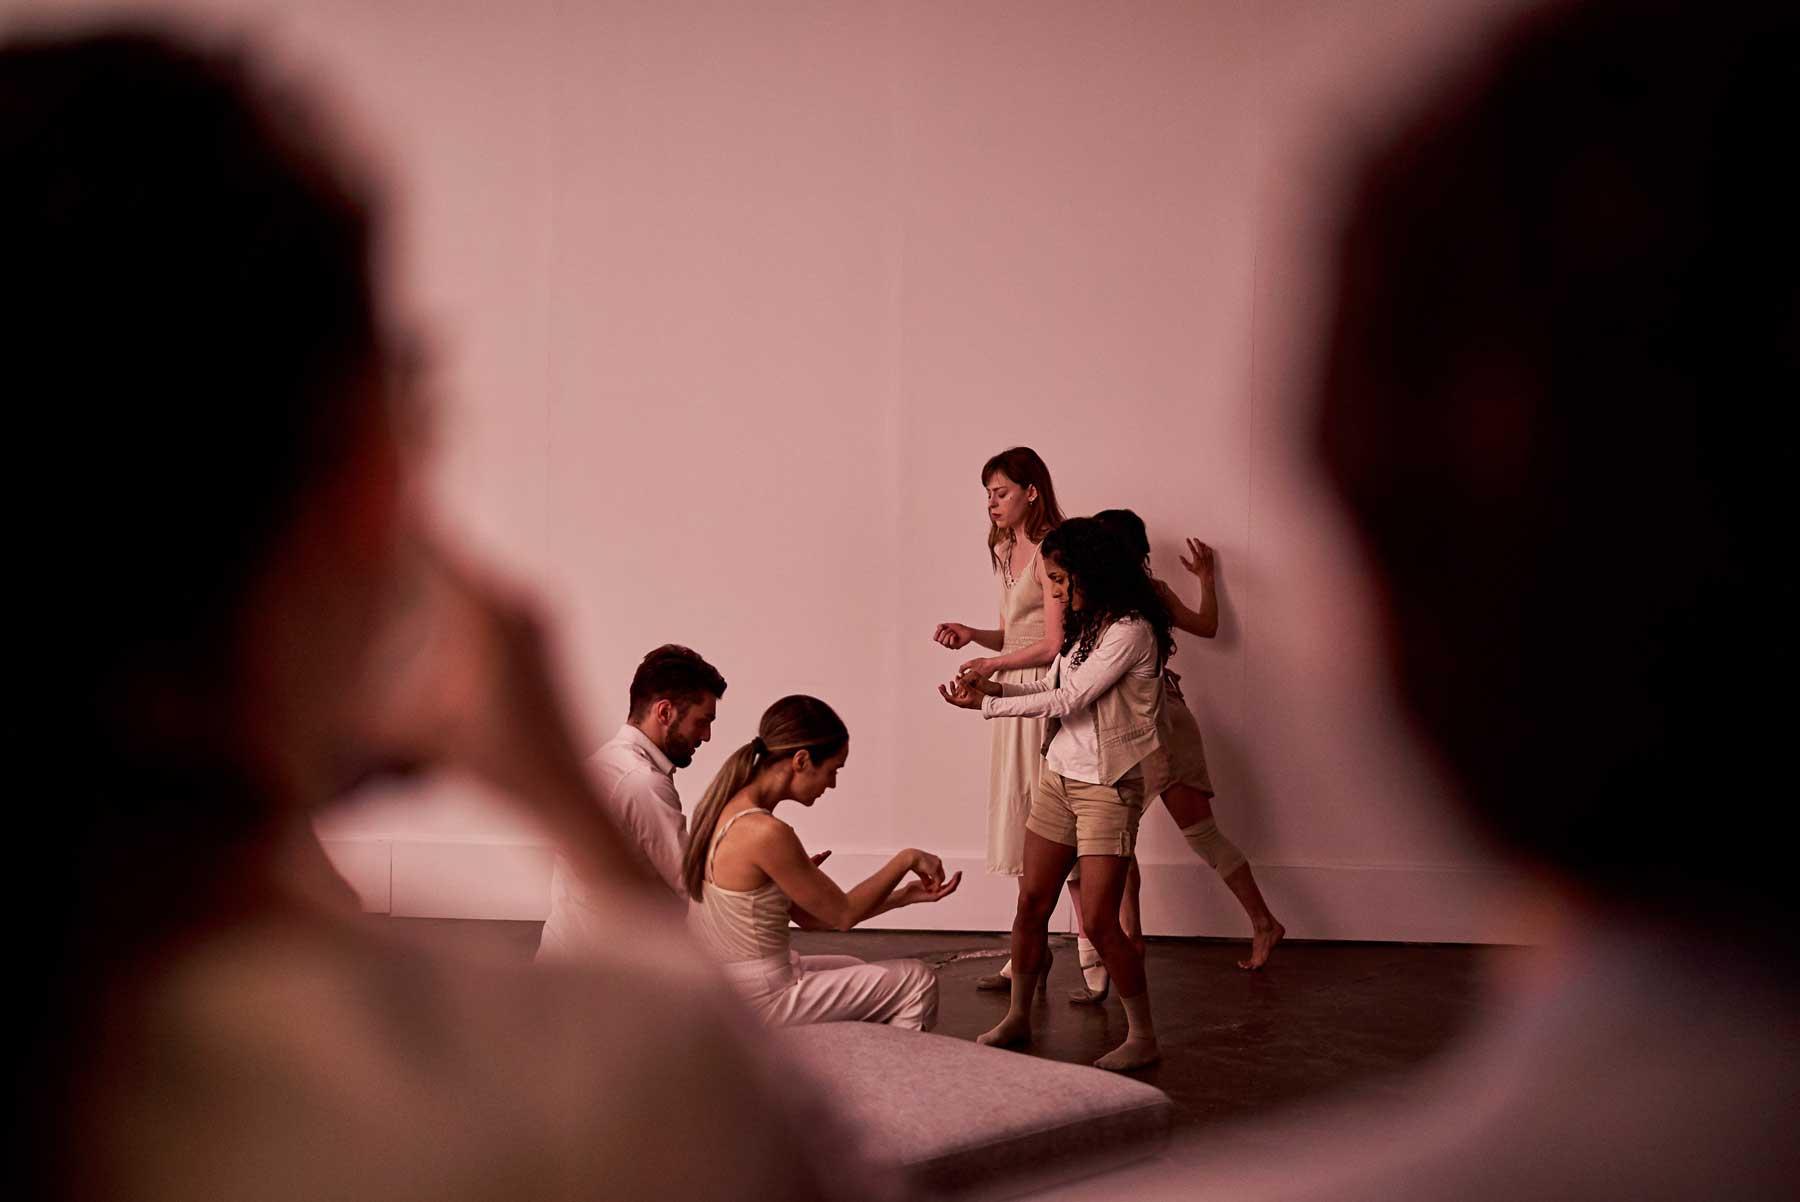 mardi-culturel-td-danse-danse-kyra-jean-green-trip-the-light-fantastic-2.jpg